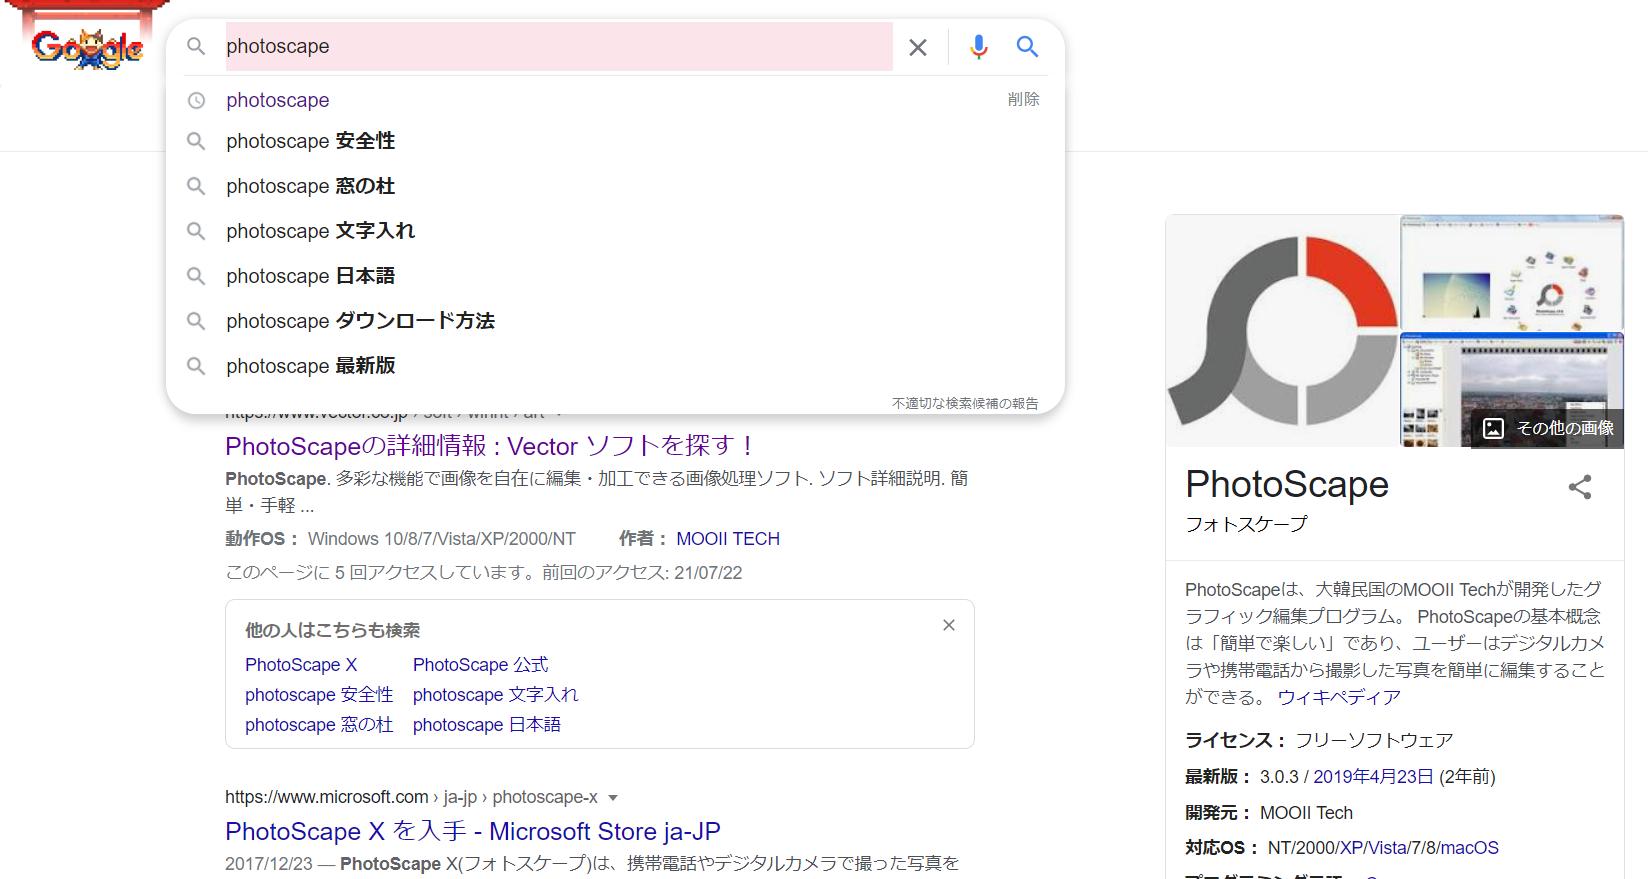 photoscape 検索.png